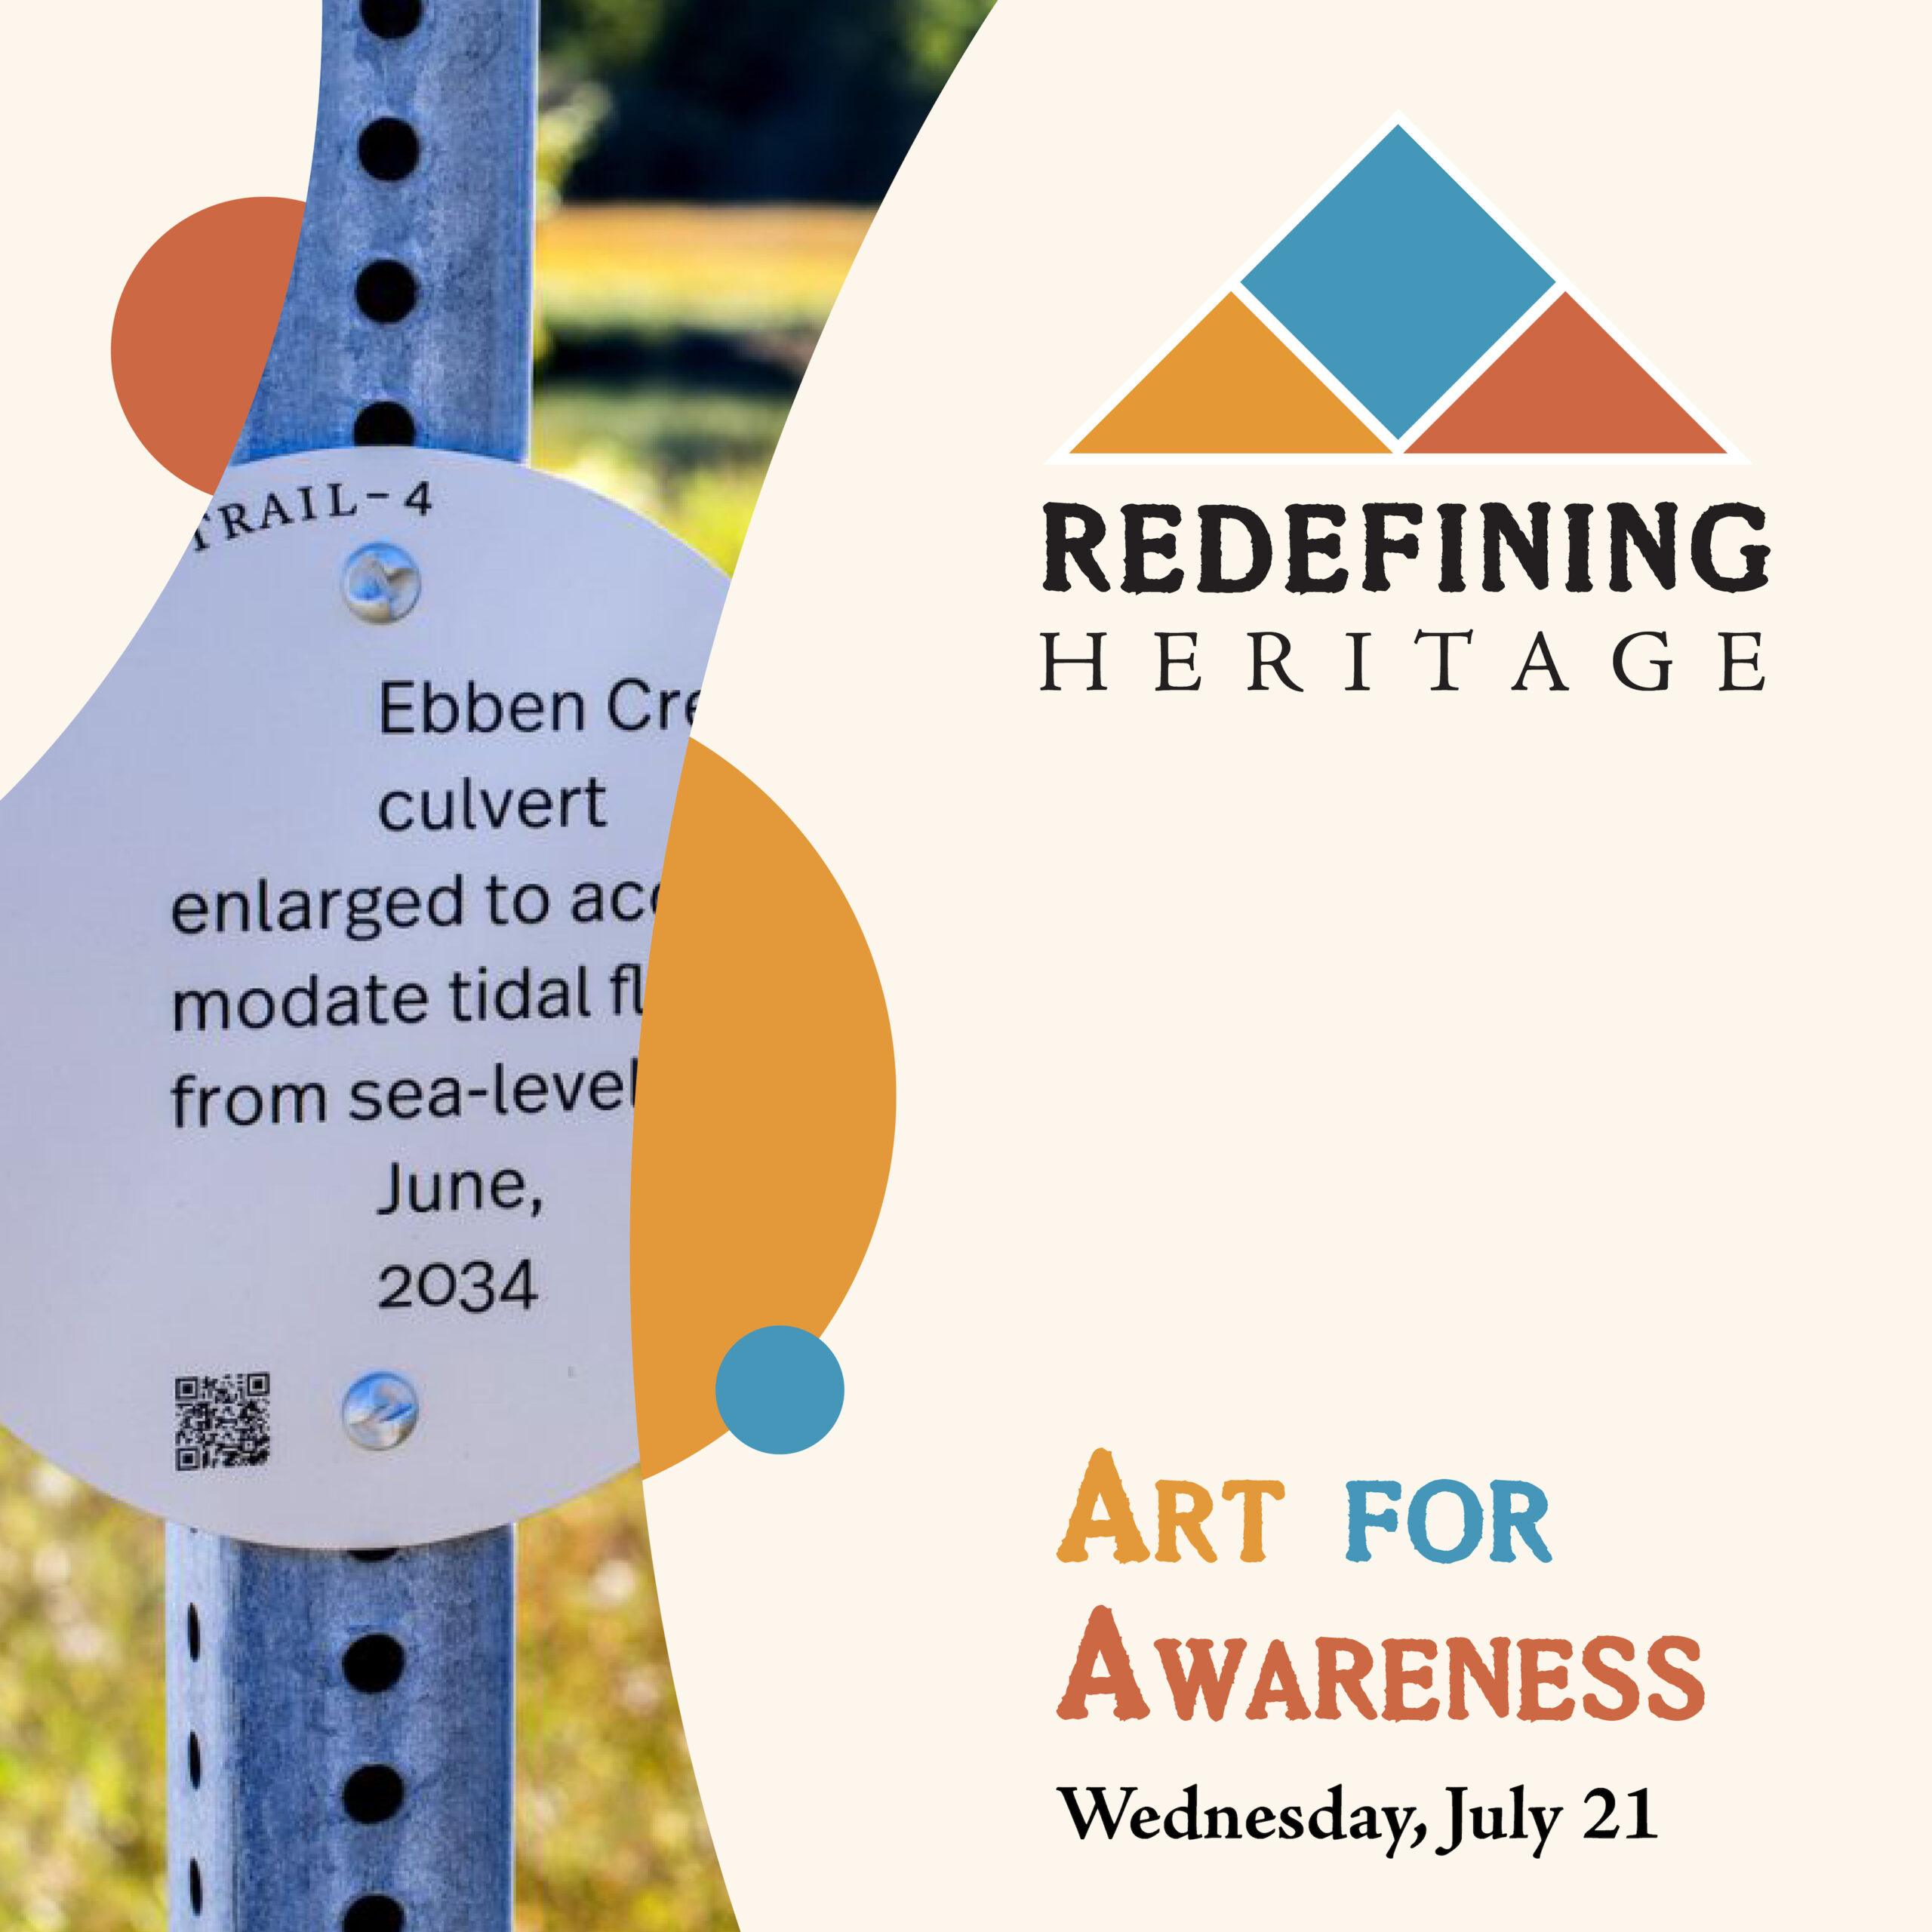 Redefining Heritage: Art for Awareness